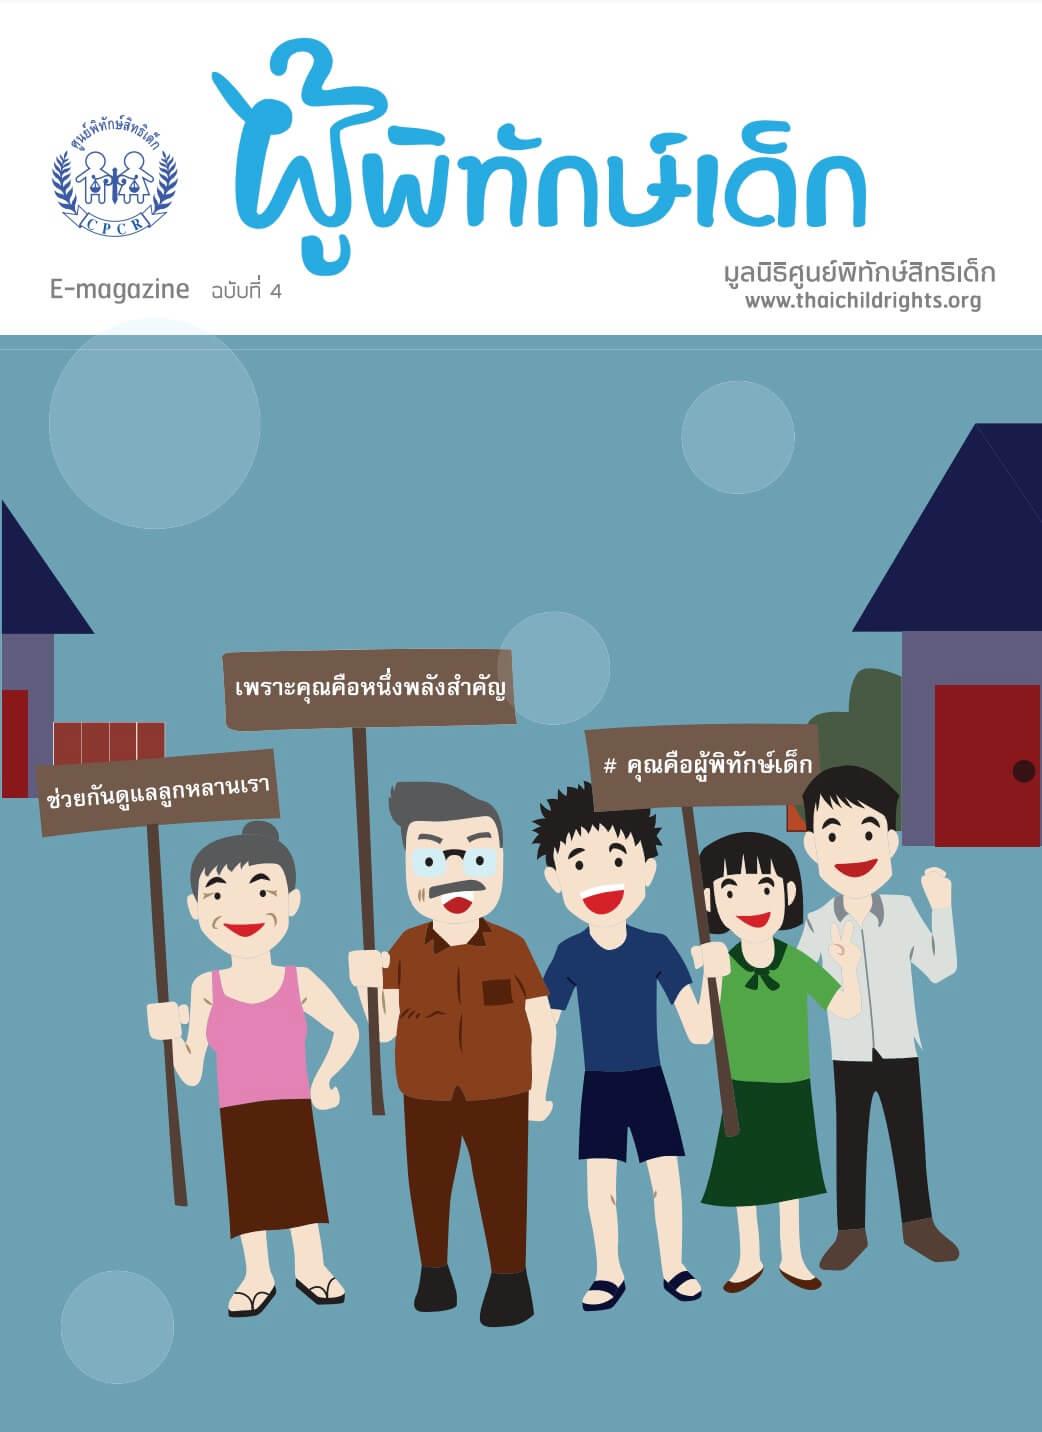 E-magazine ฉบับที่ 4 #คุณคือผู้พิทักษ์เด็ก